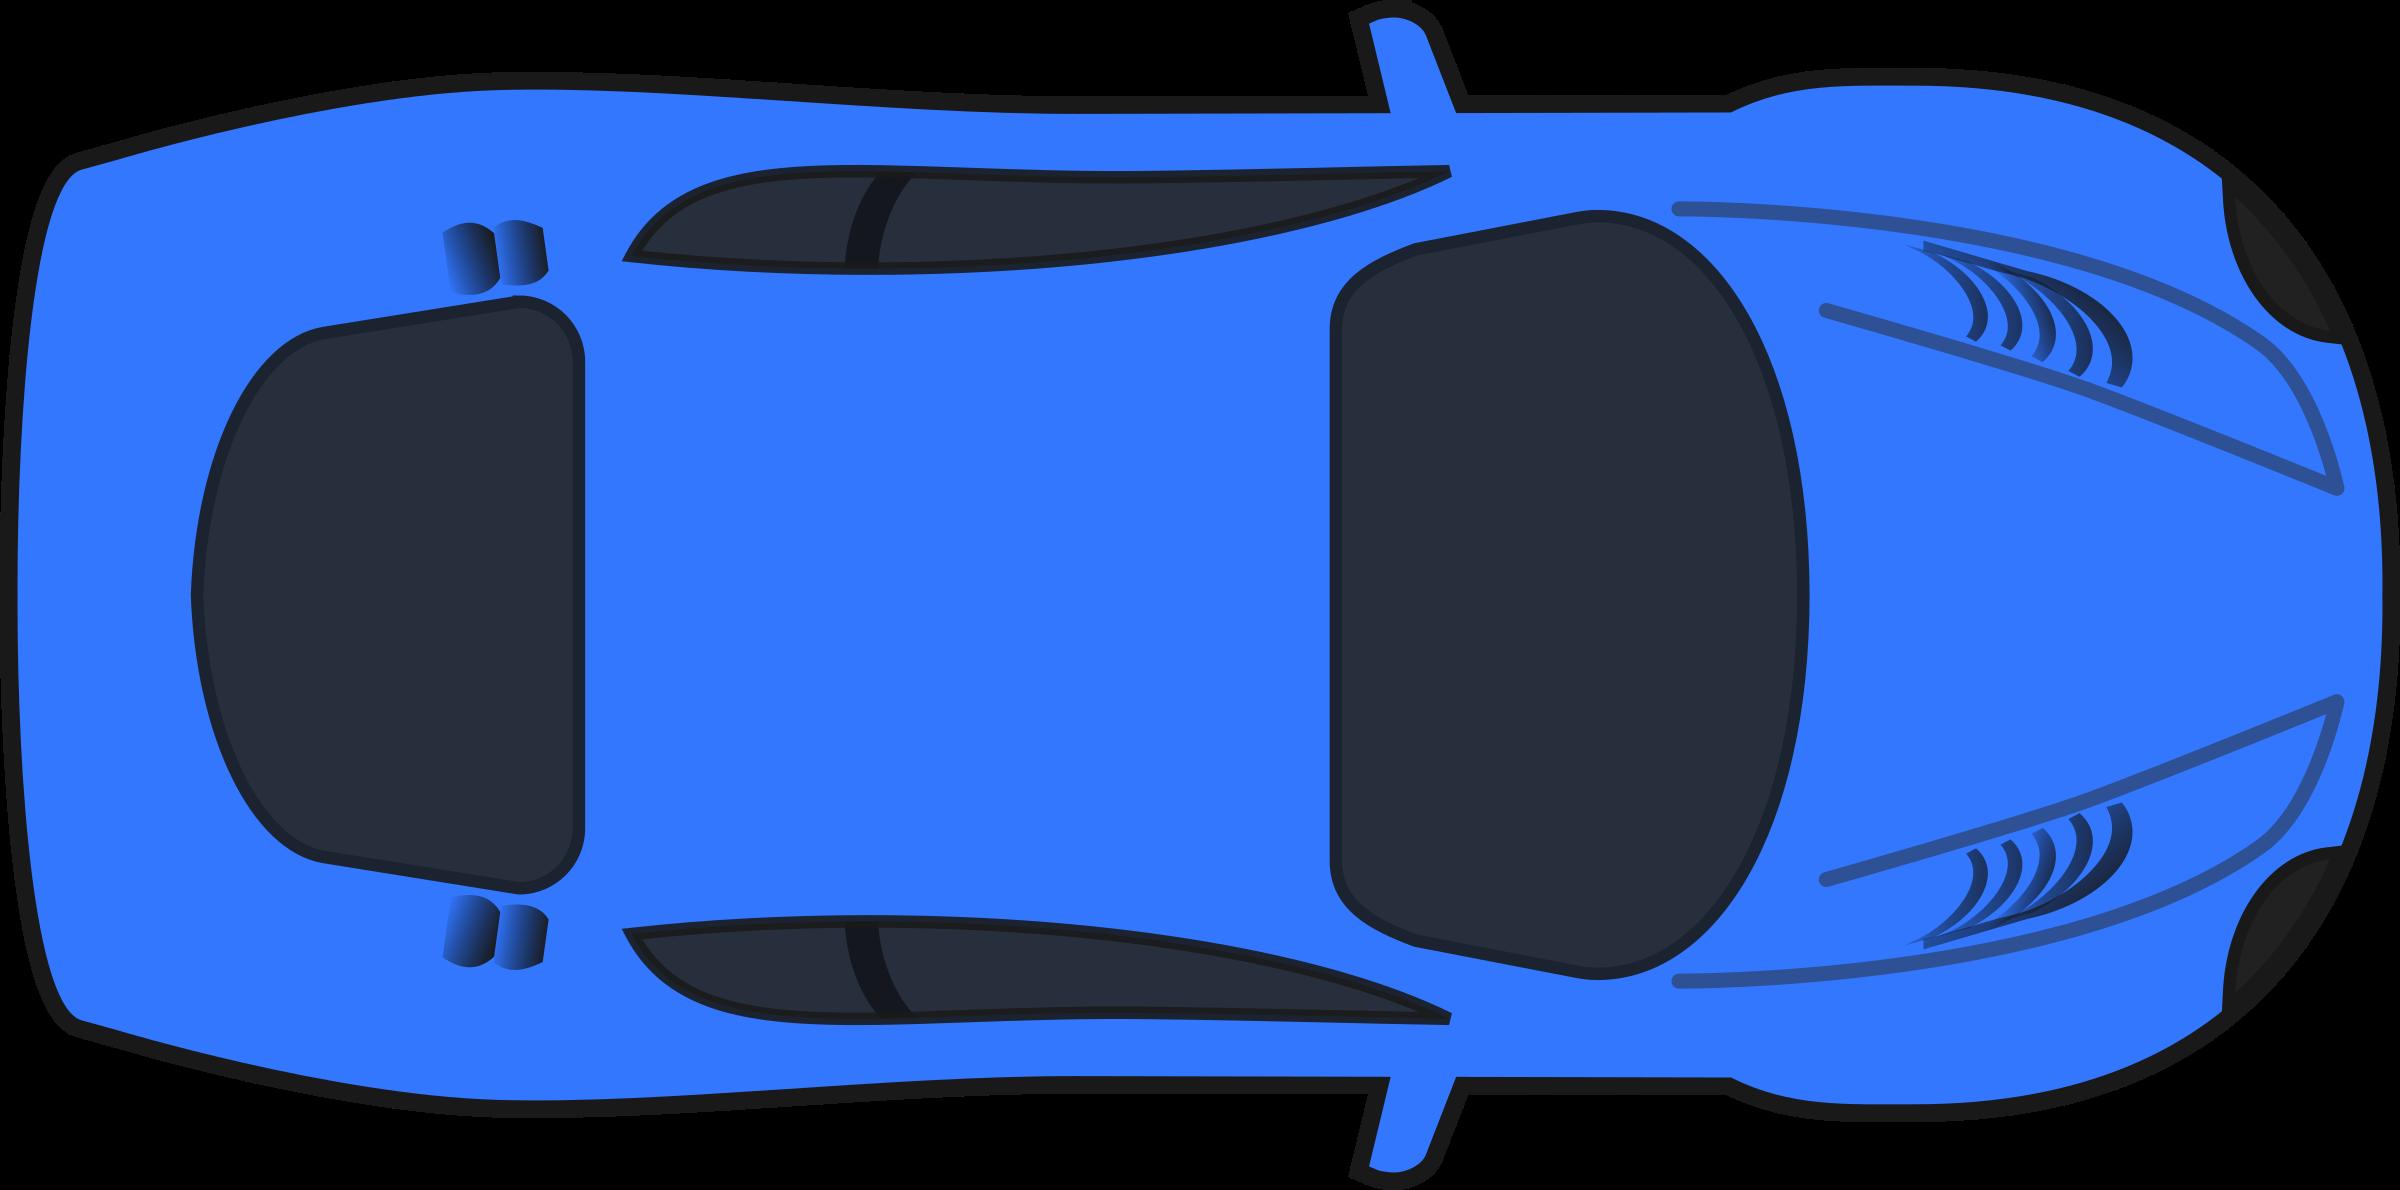 Race Car clipart simple Dark Blue Car Dark Clipart